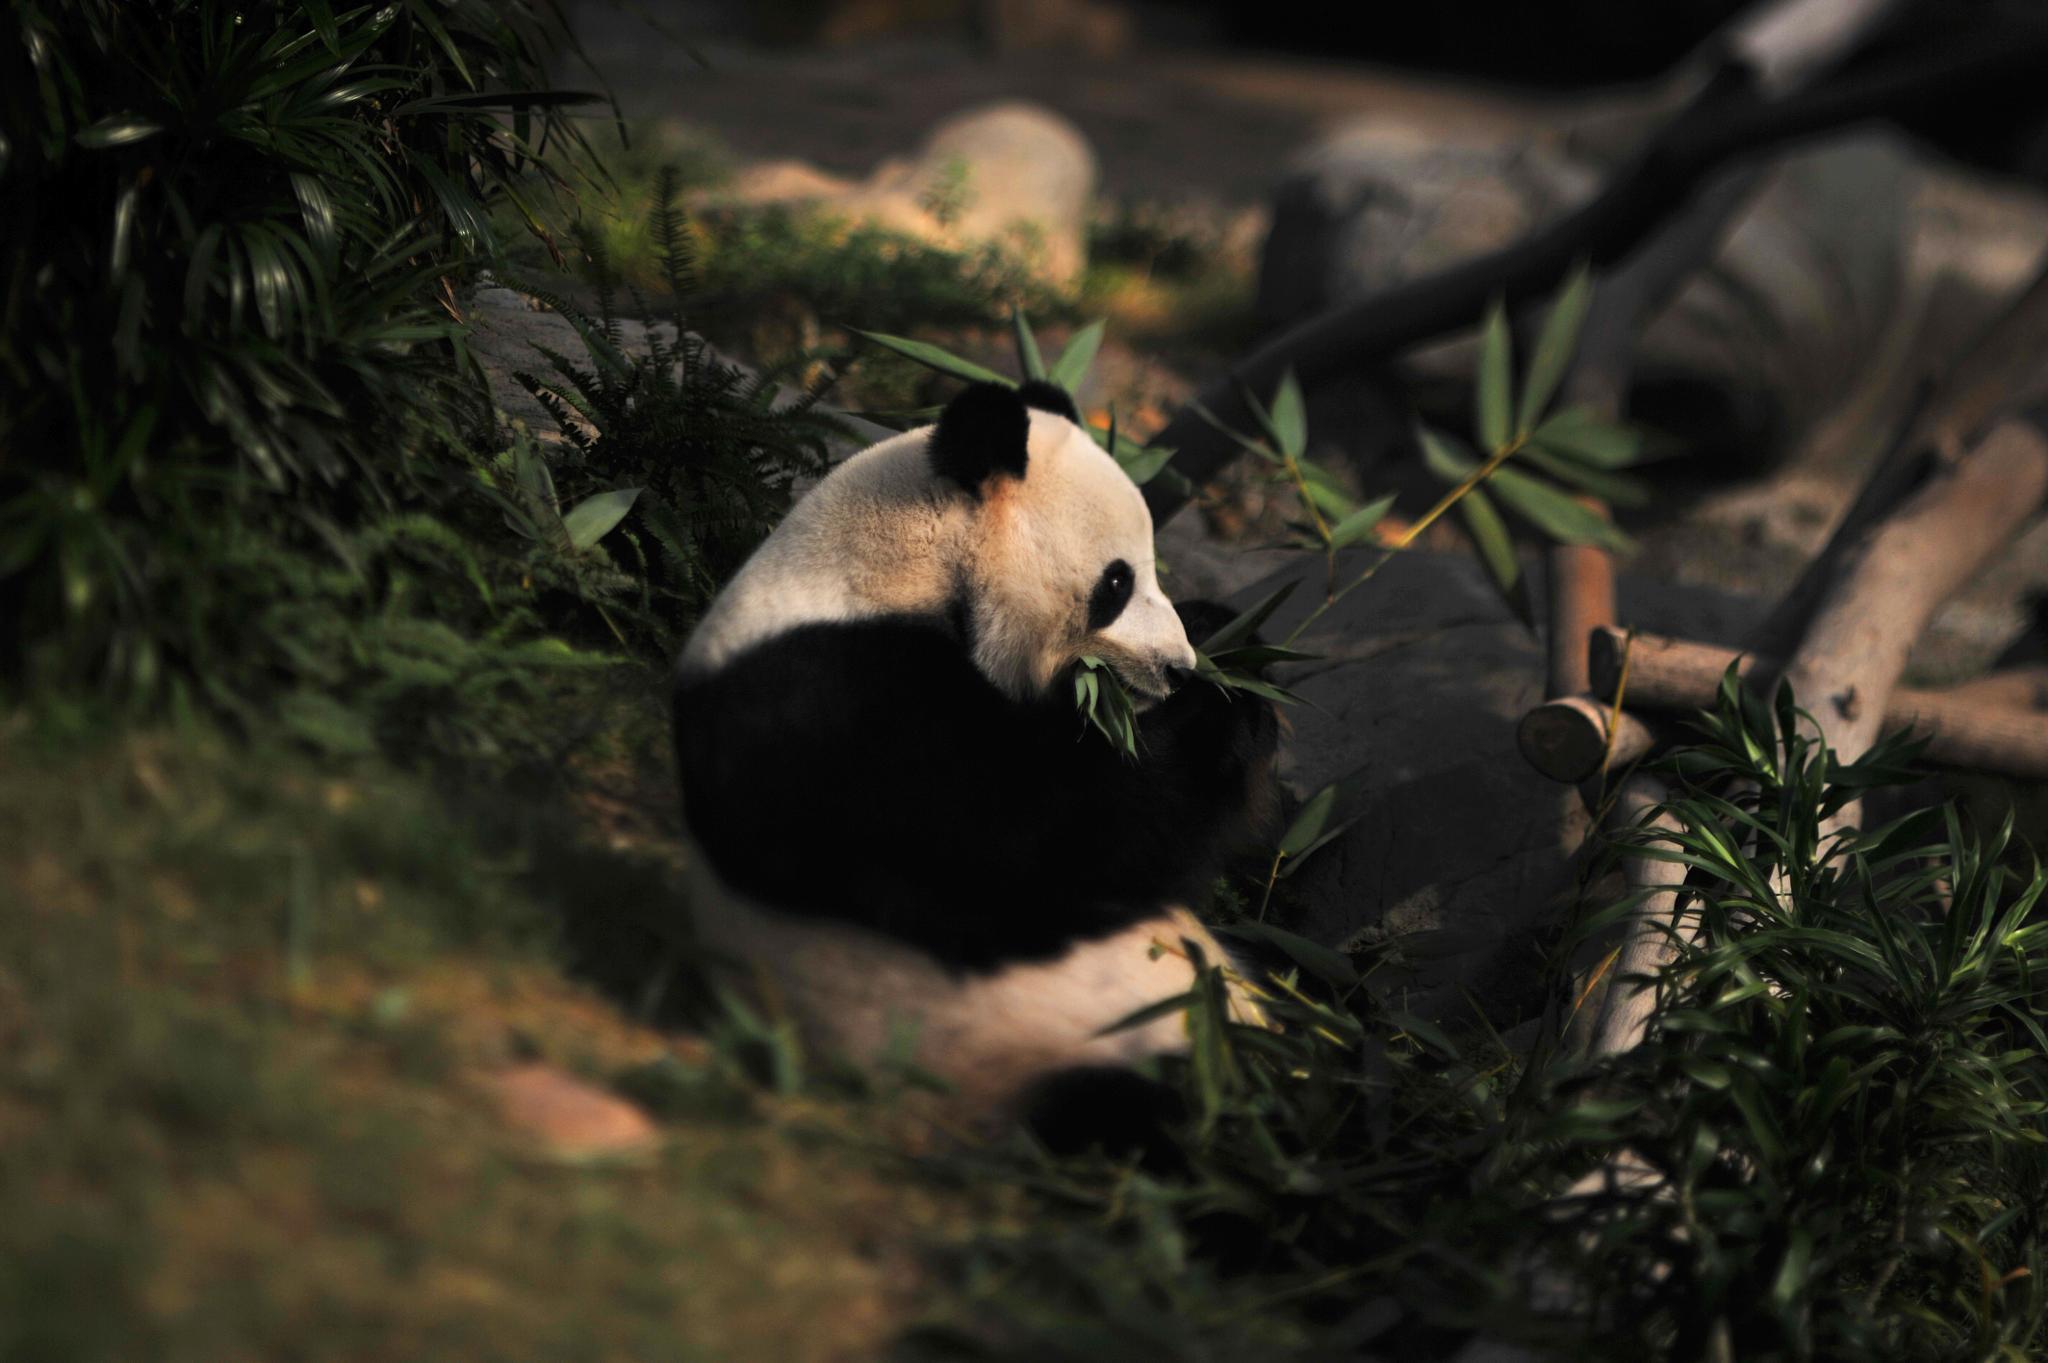 ...the Panda at the Ocean Park, Hongkong... by cyccanhk